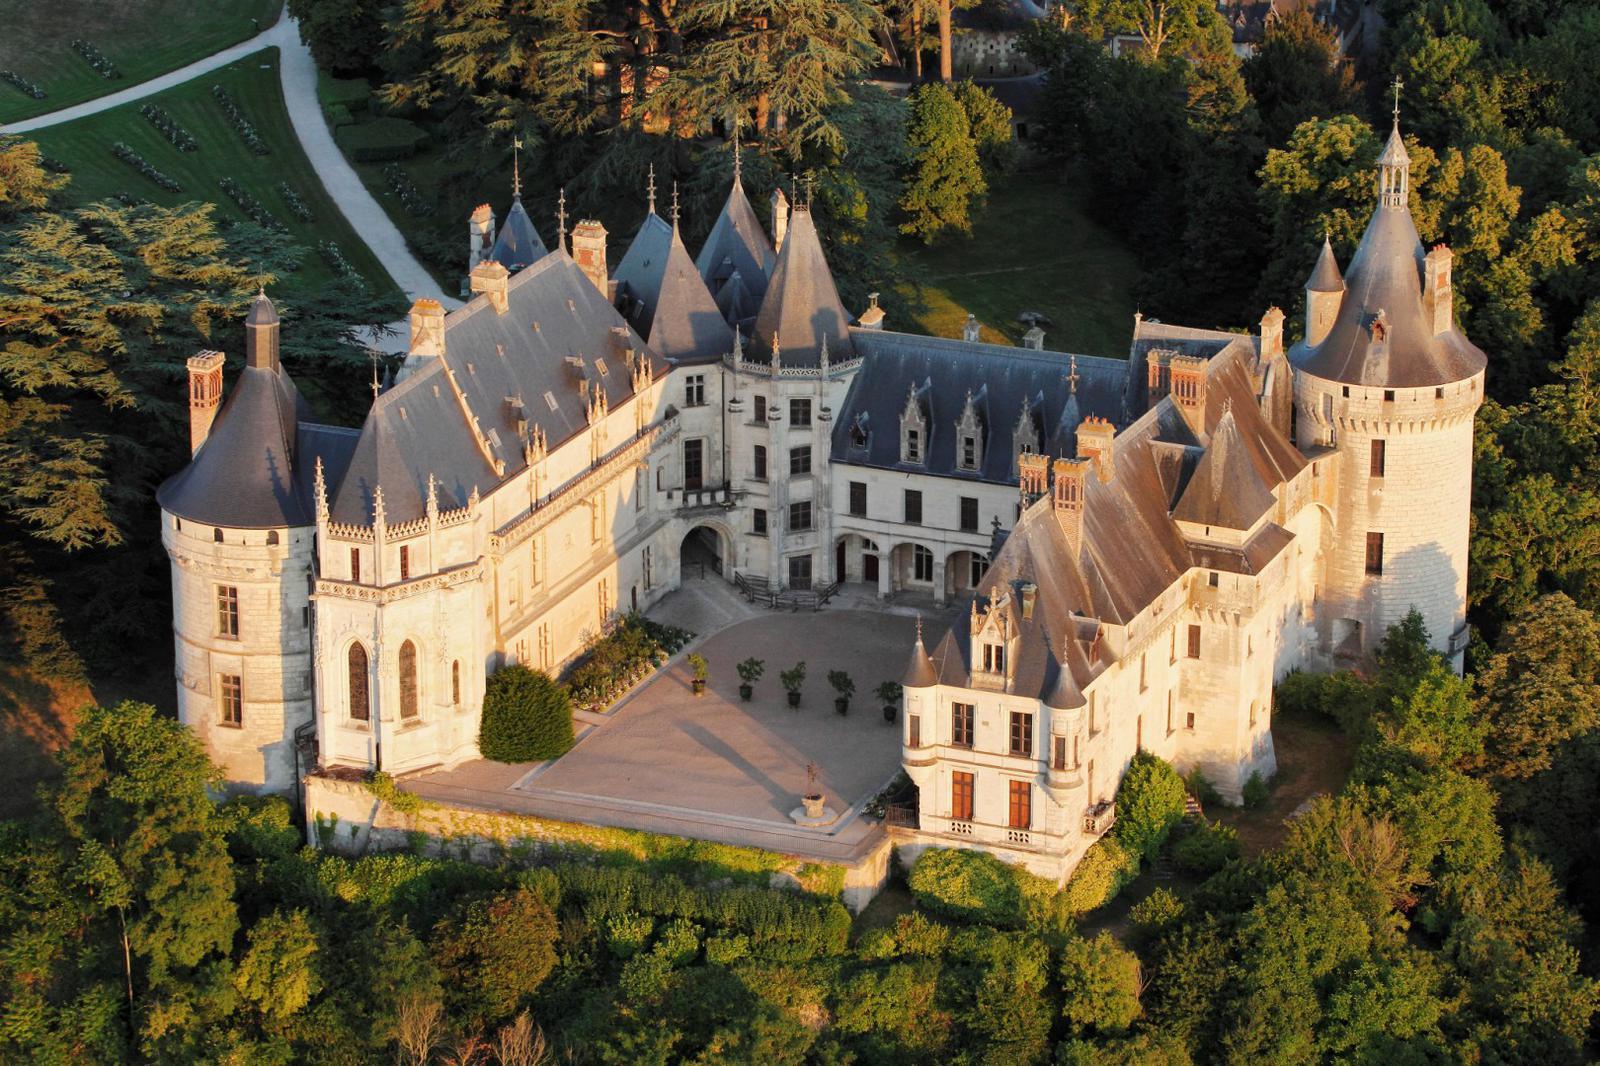 noche de halloween Castillo de Chaumont